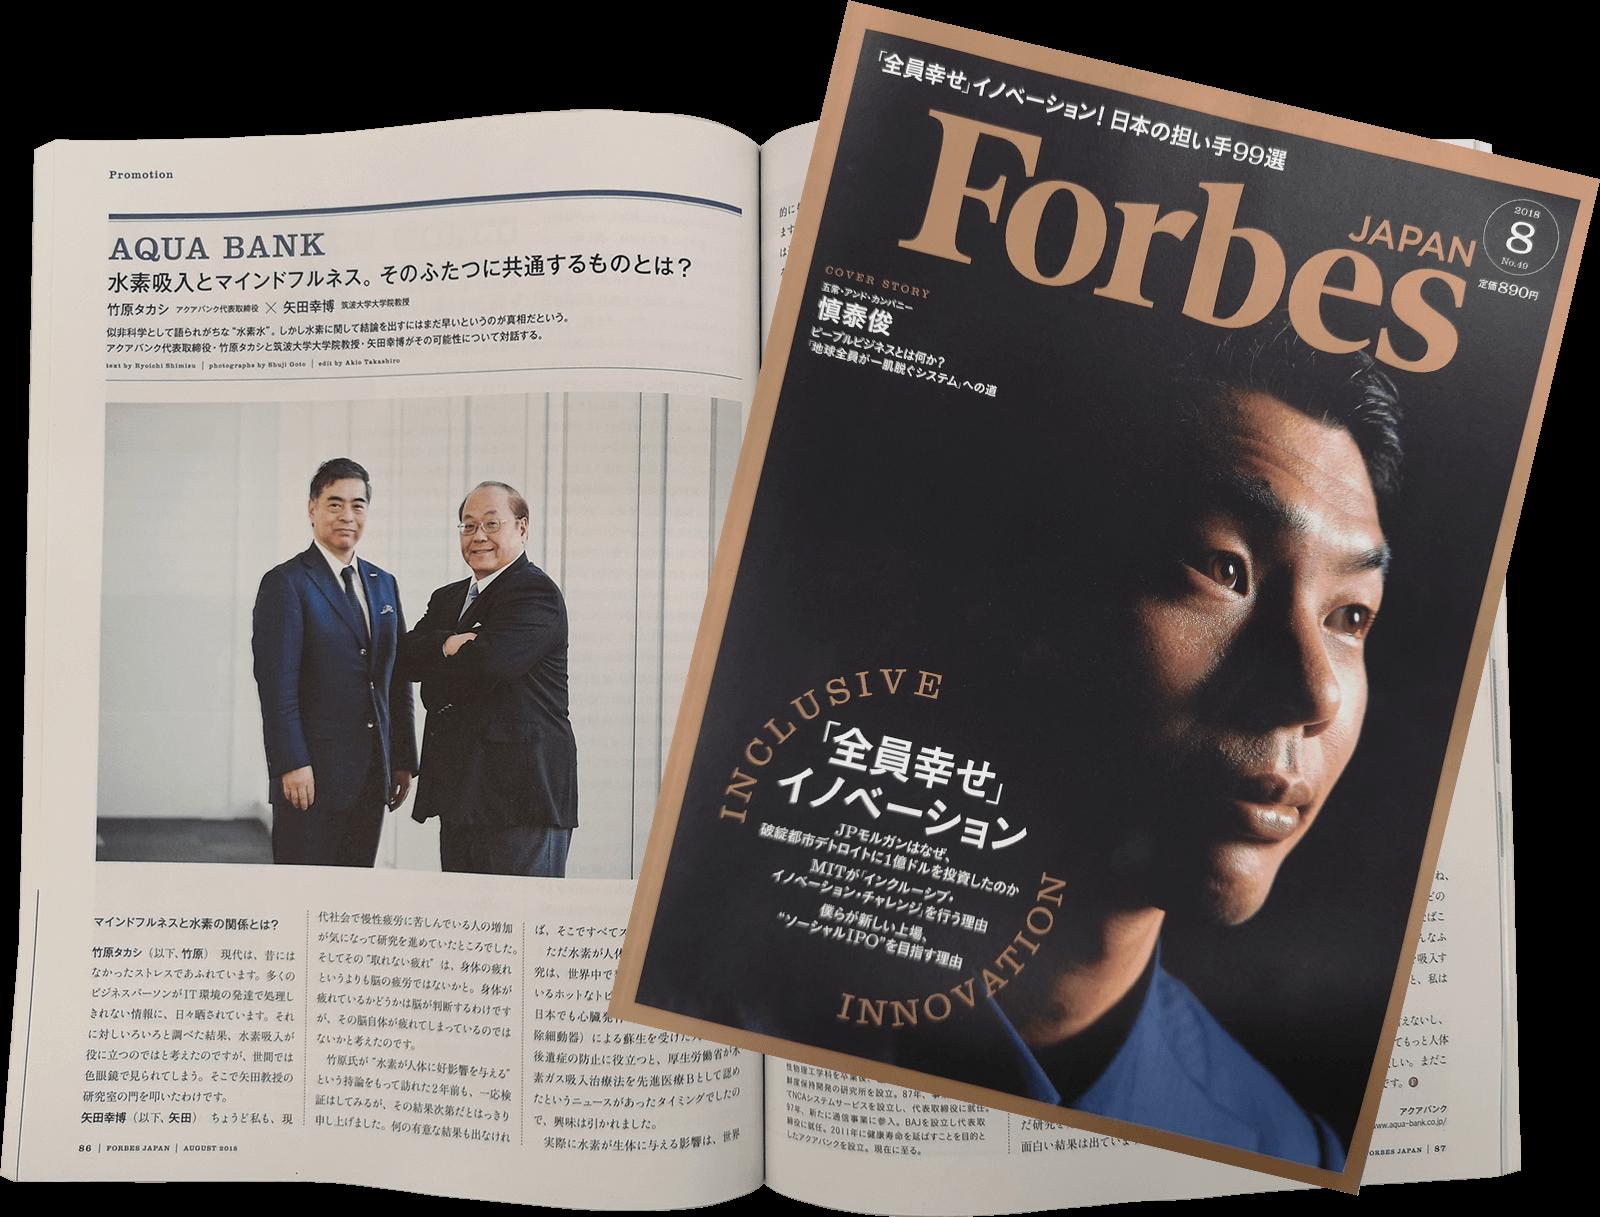 『Forbes JAPAN』2018年8月号